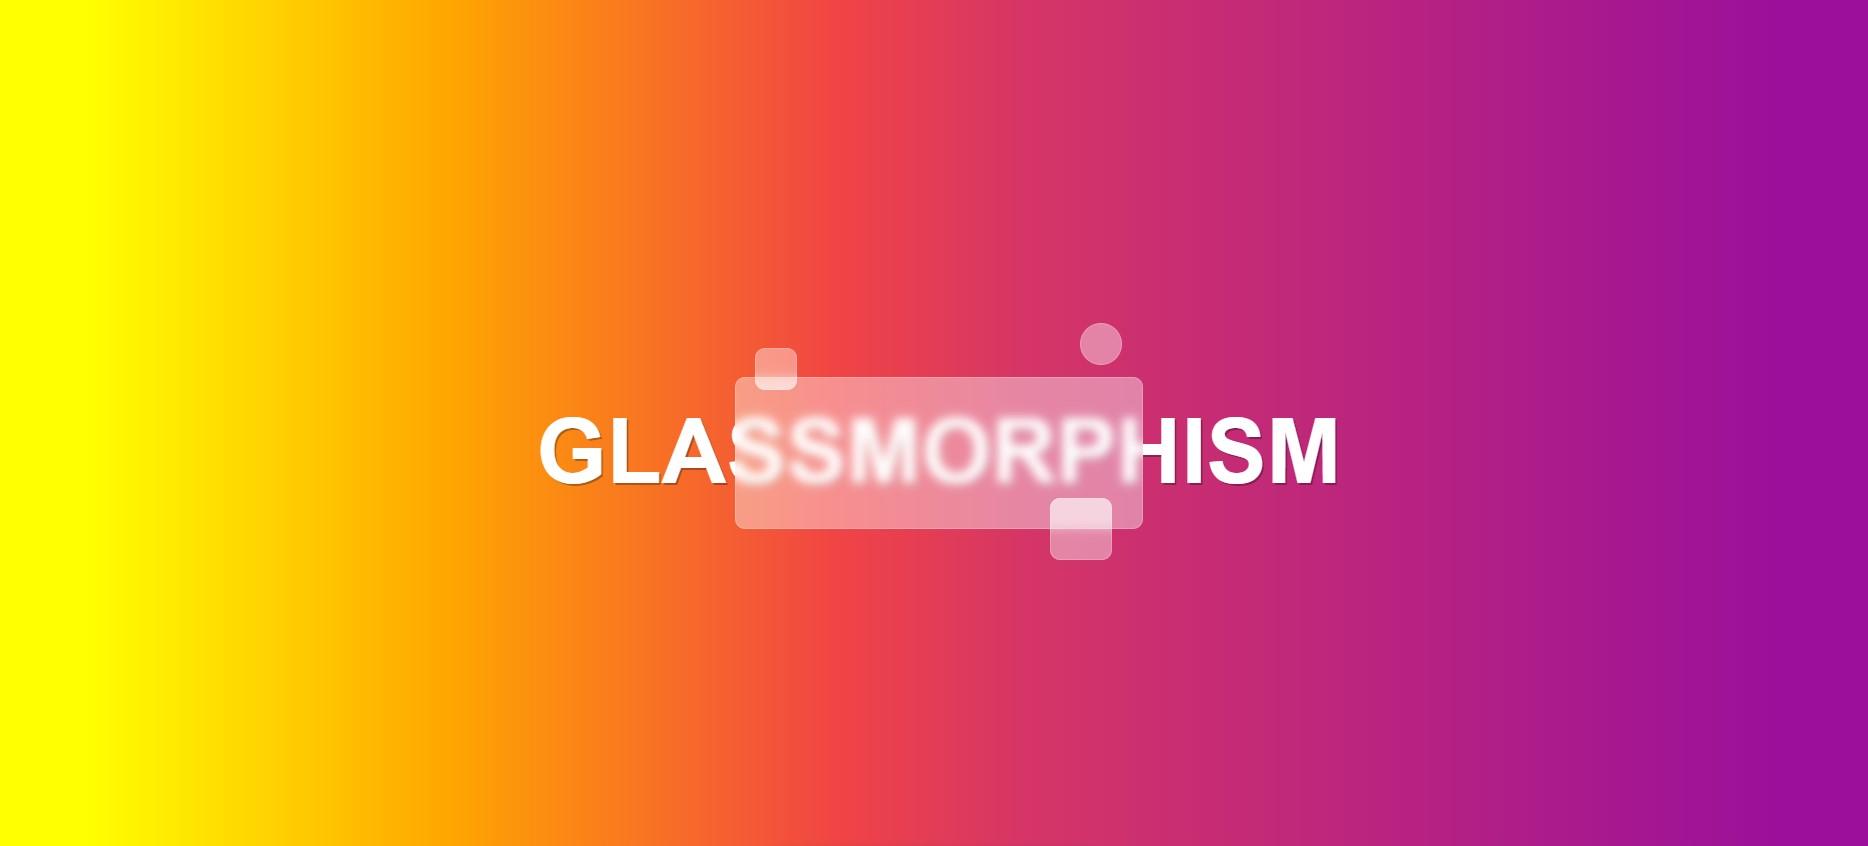 10 Beautiful Glassmorphism Examples - 1stWebDesigner